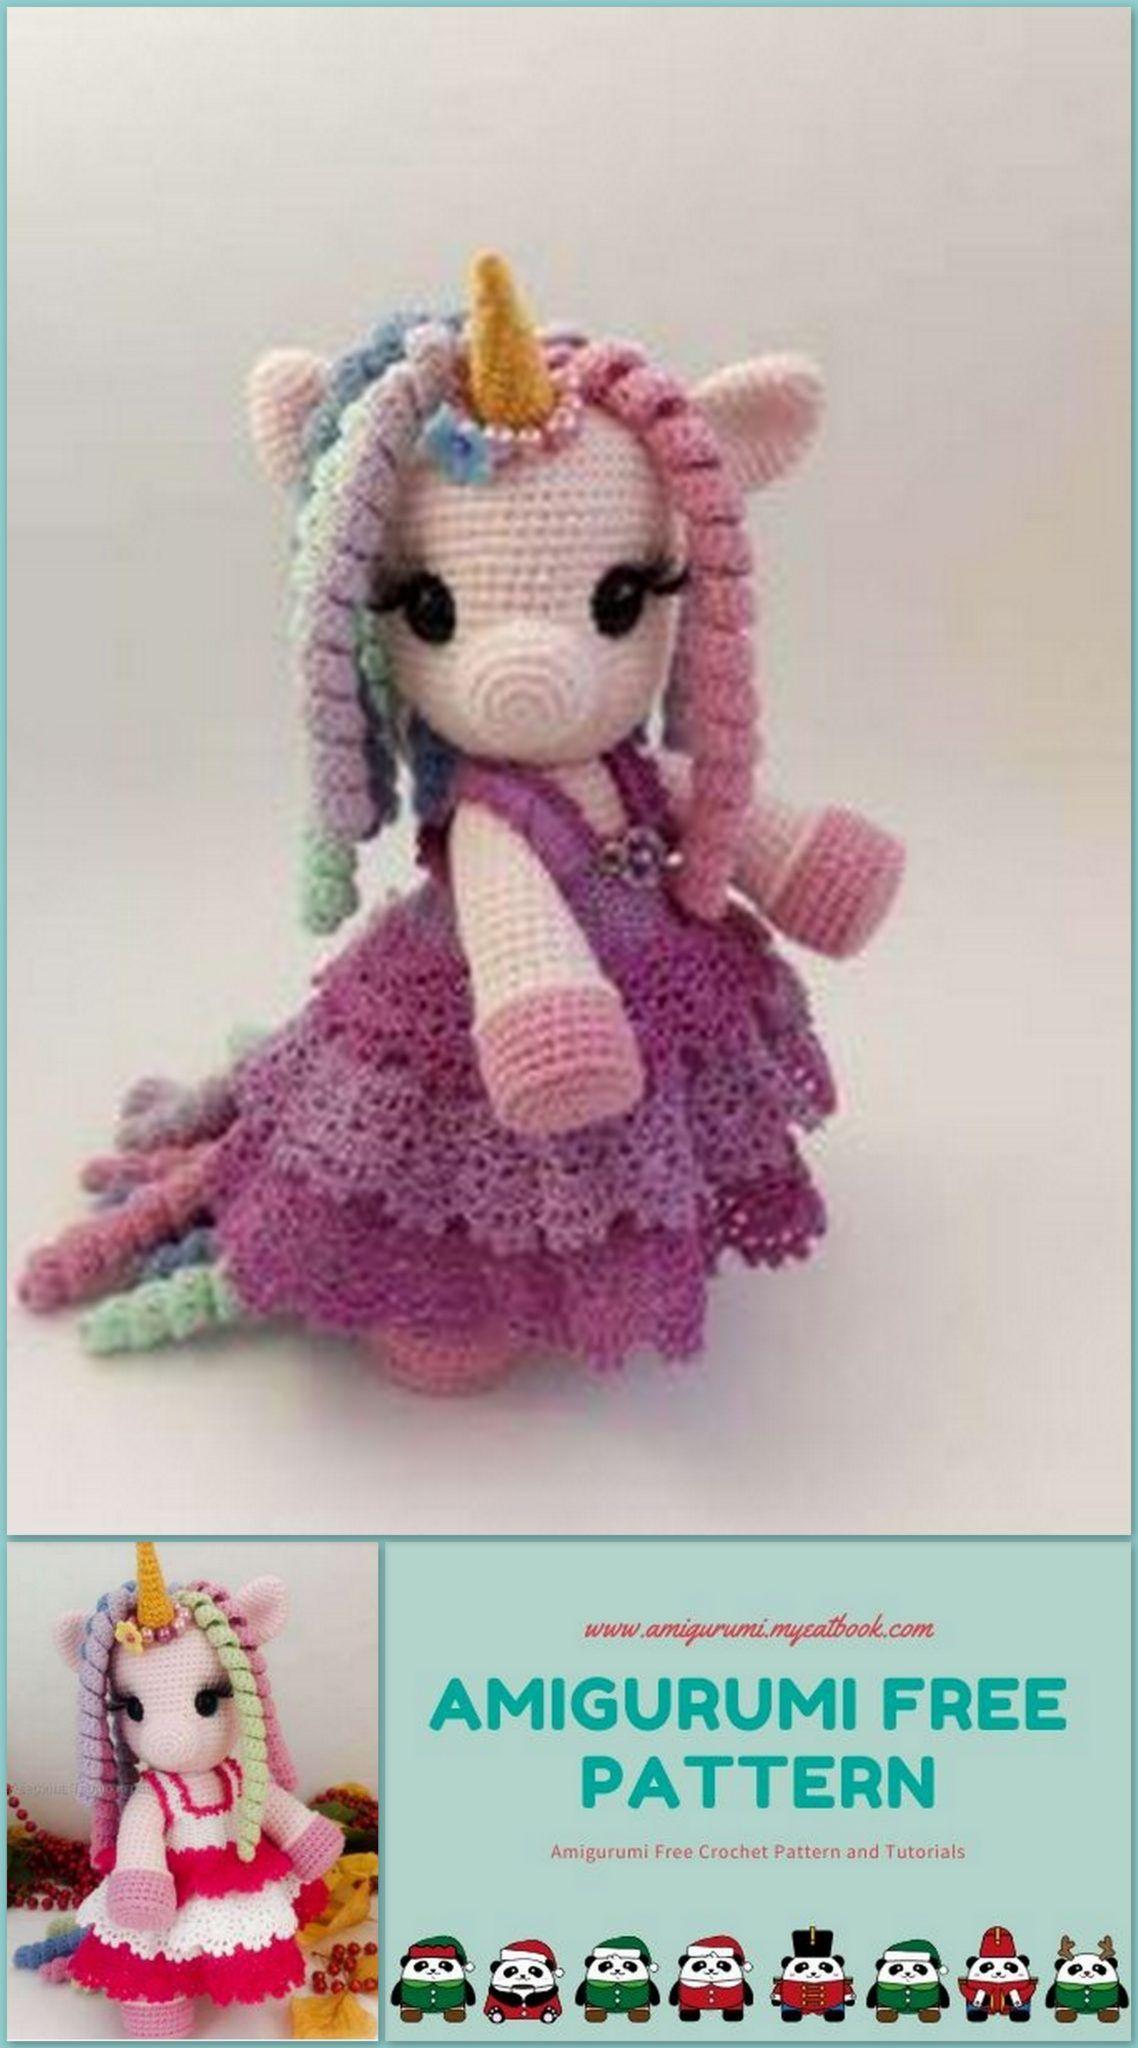 10 Free Amigurumi Crochet Patterns - Link Blast | Wzory amigurumi ... | 2048x1138